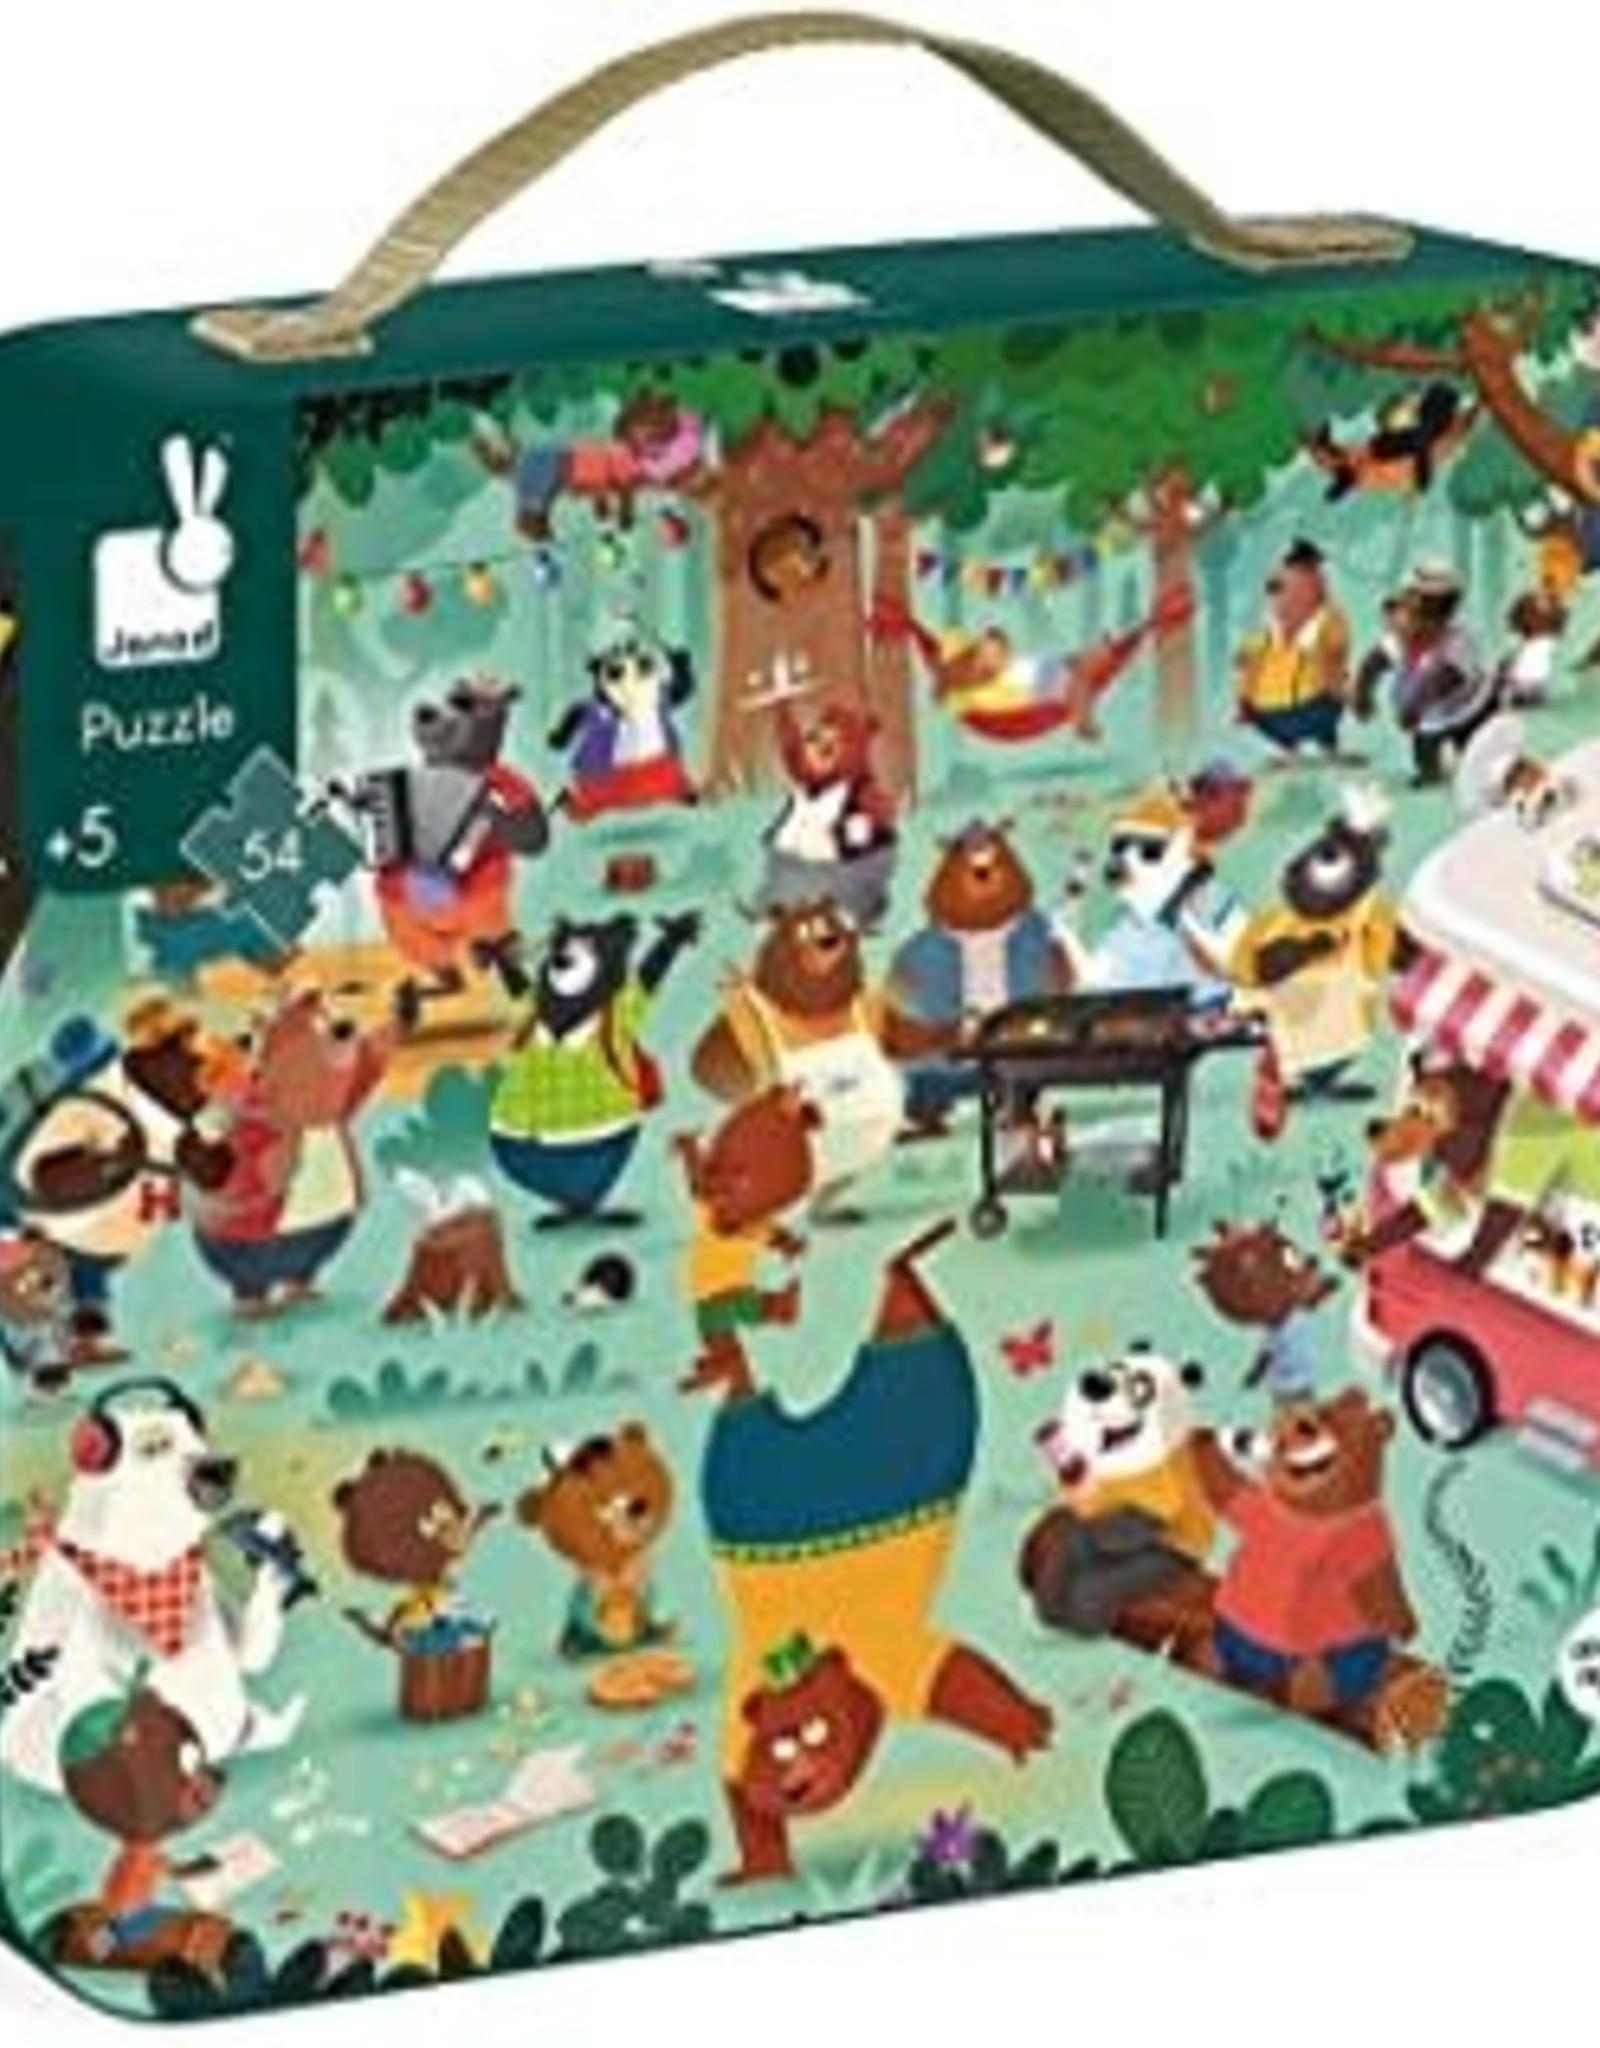 Janod 54 pc Puzzle Family Bears